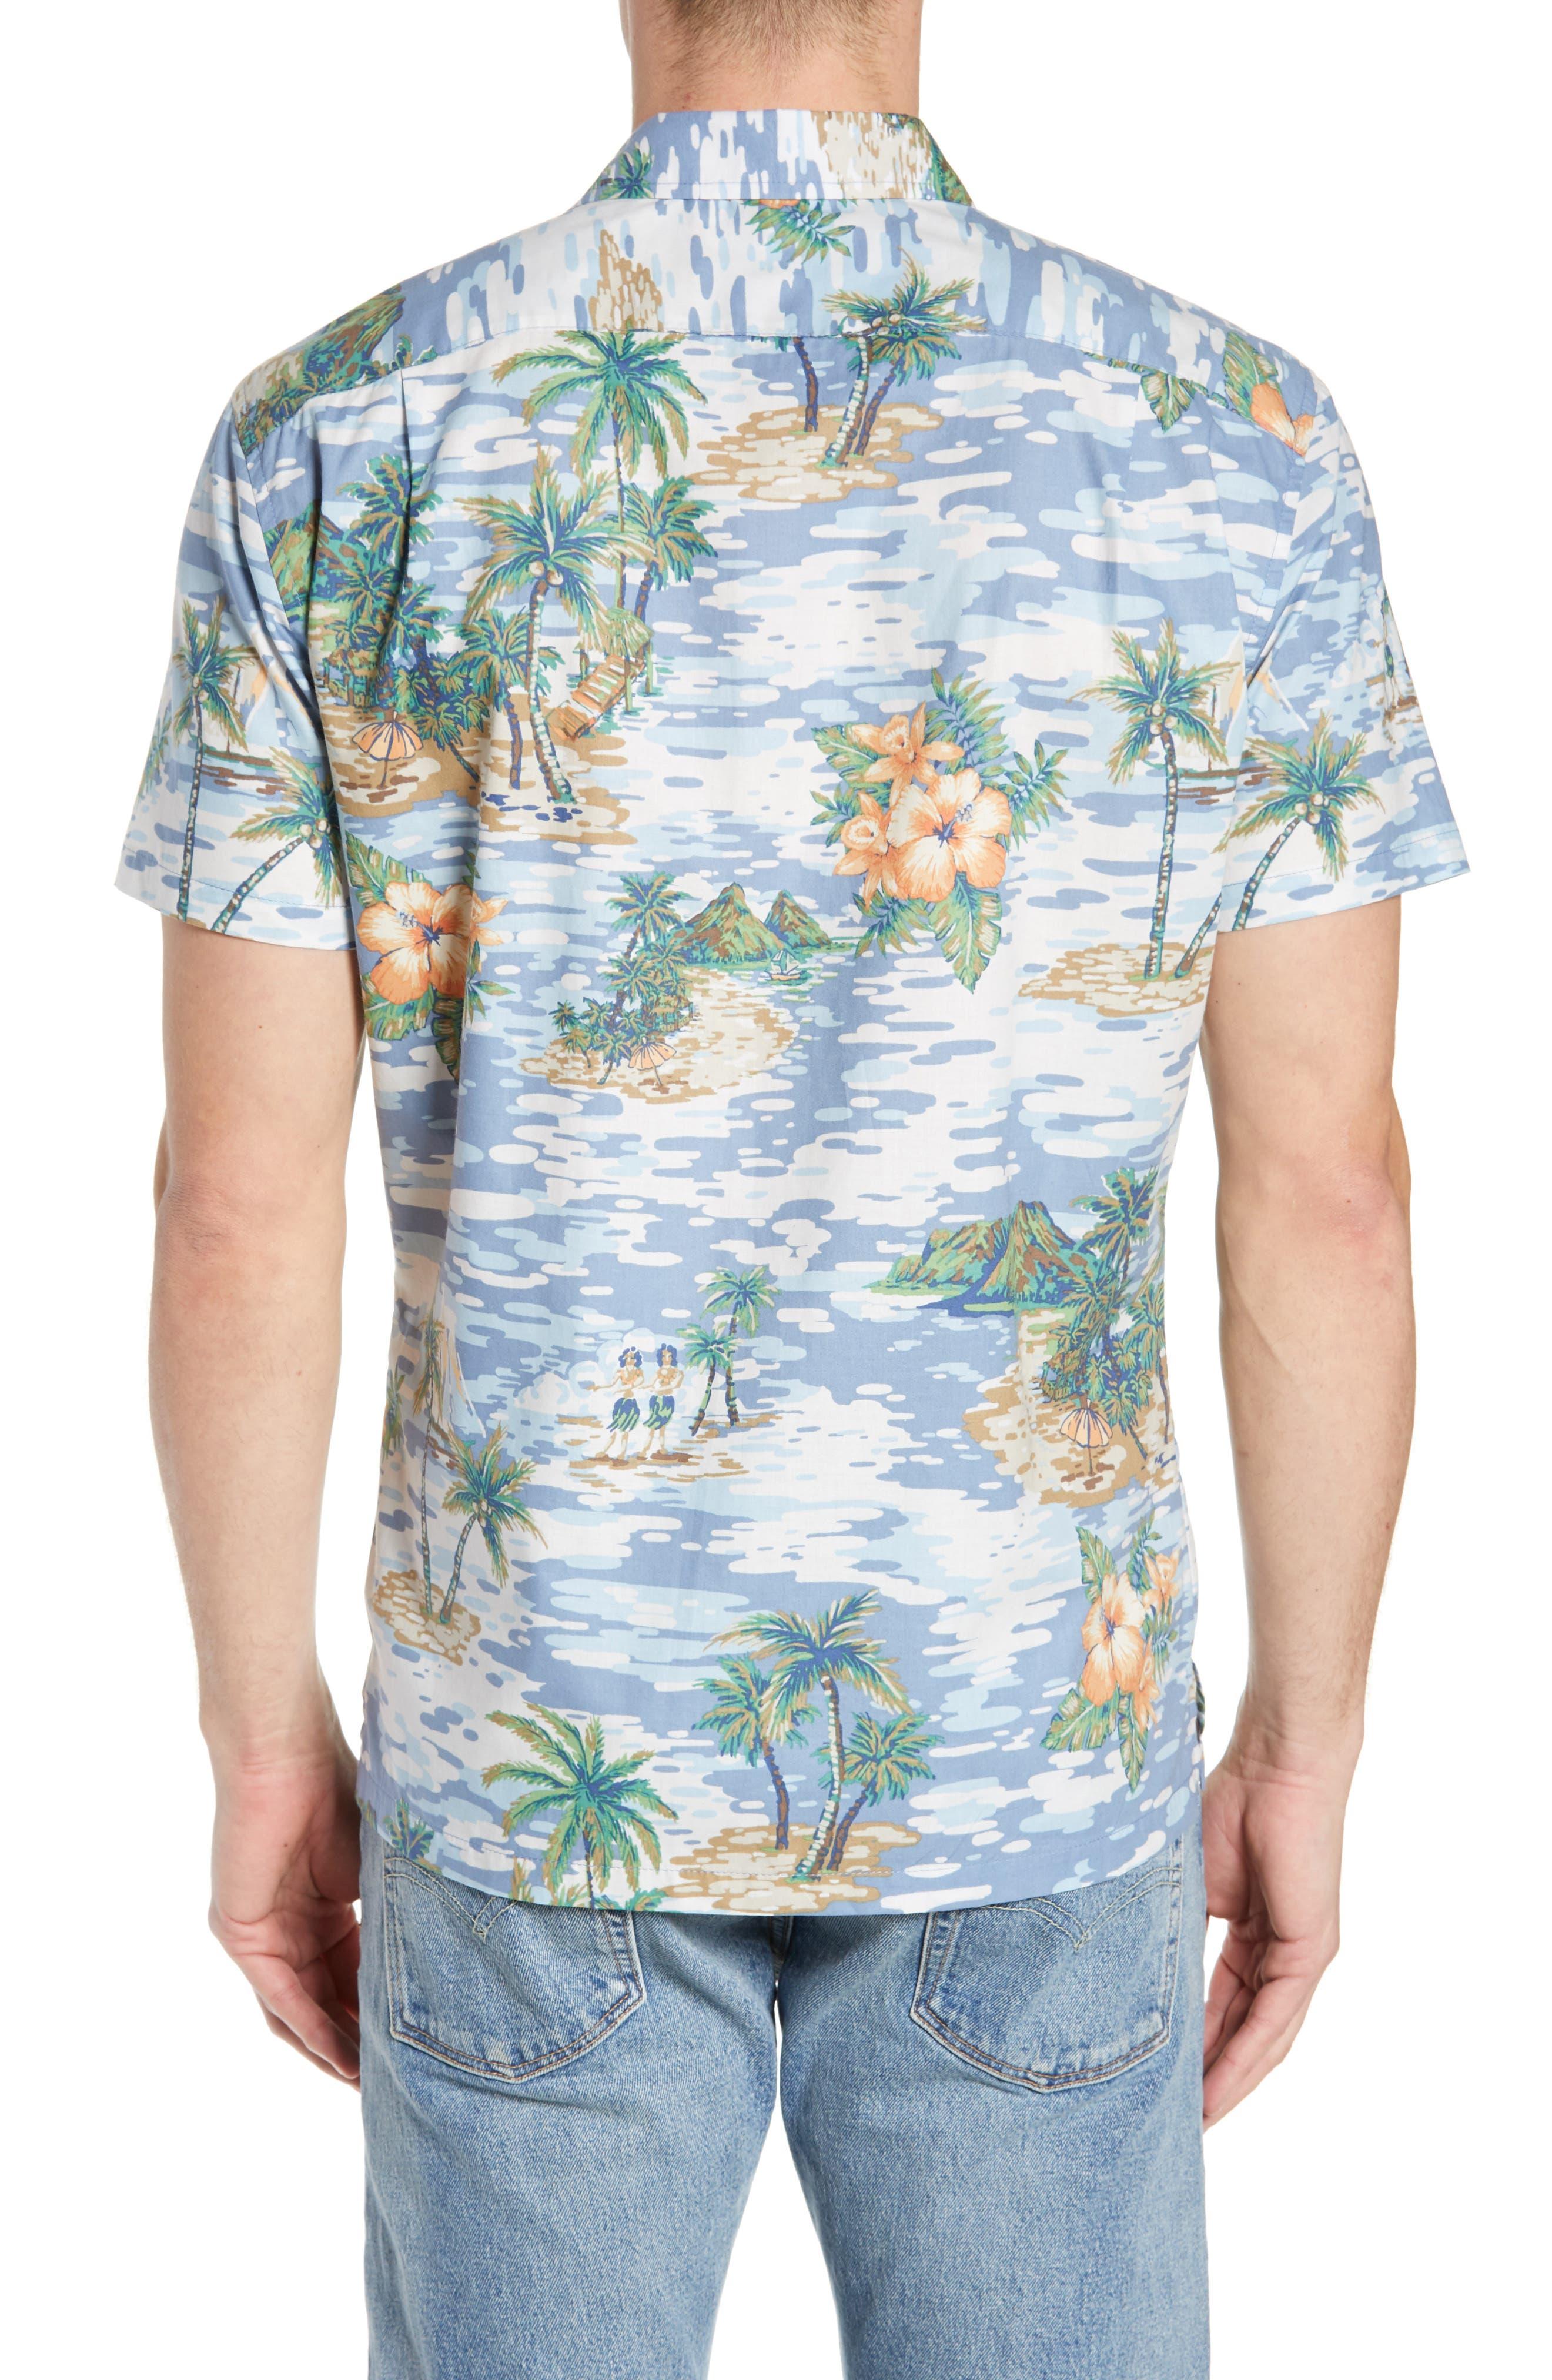 TORI RICHARD, Archipelago Regular Fit Sport Shirt, Alternate thumbnail 3, color, 061